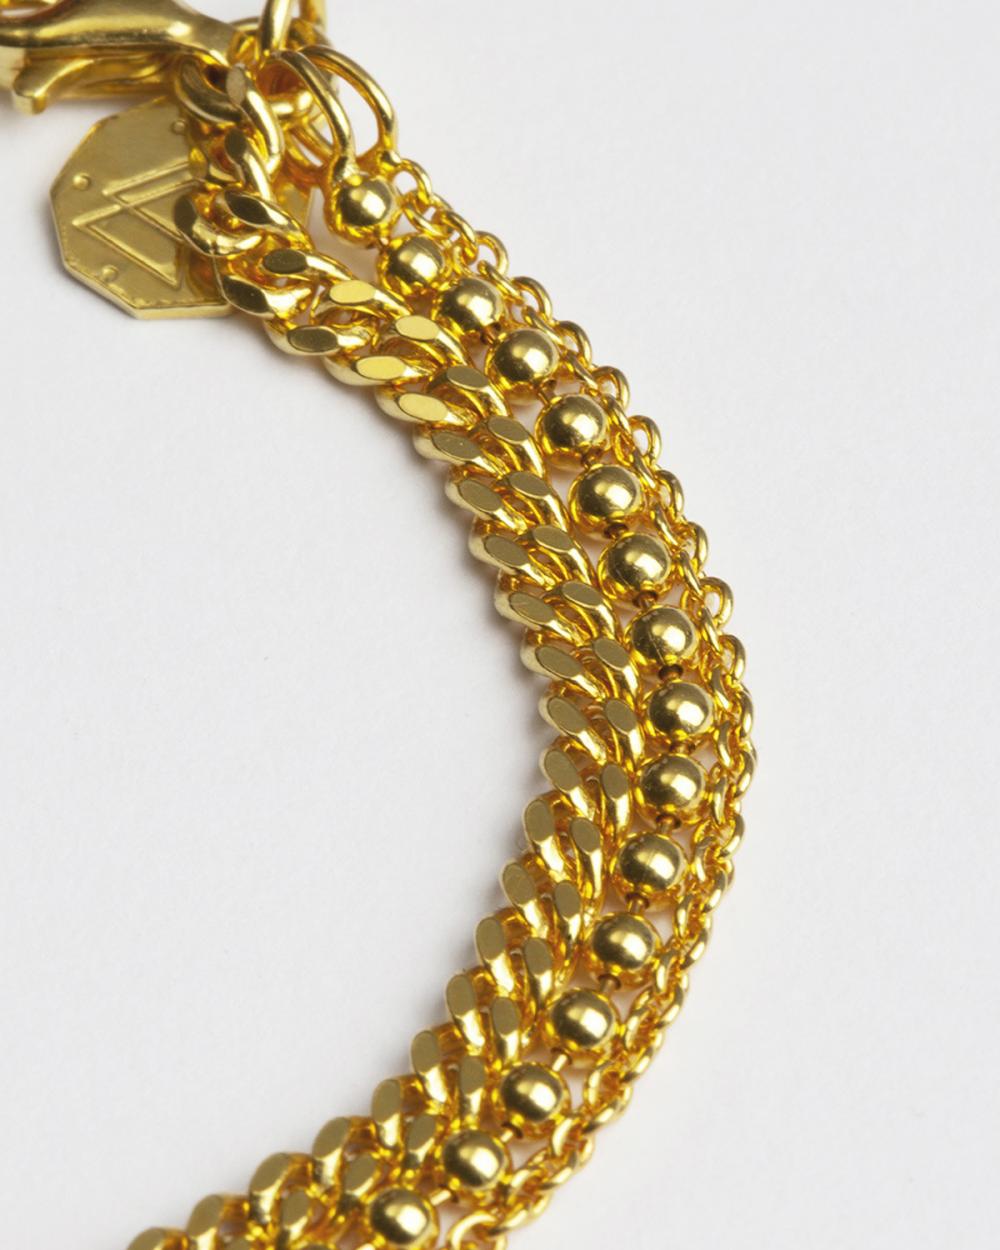 Bracelets YELLOW GOLD THREE LAYERS CHAIN BRACELET NOVE25